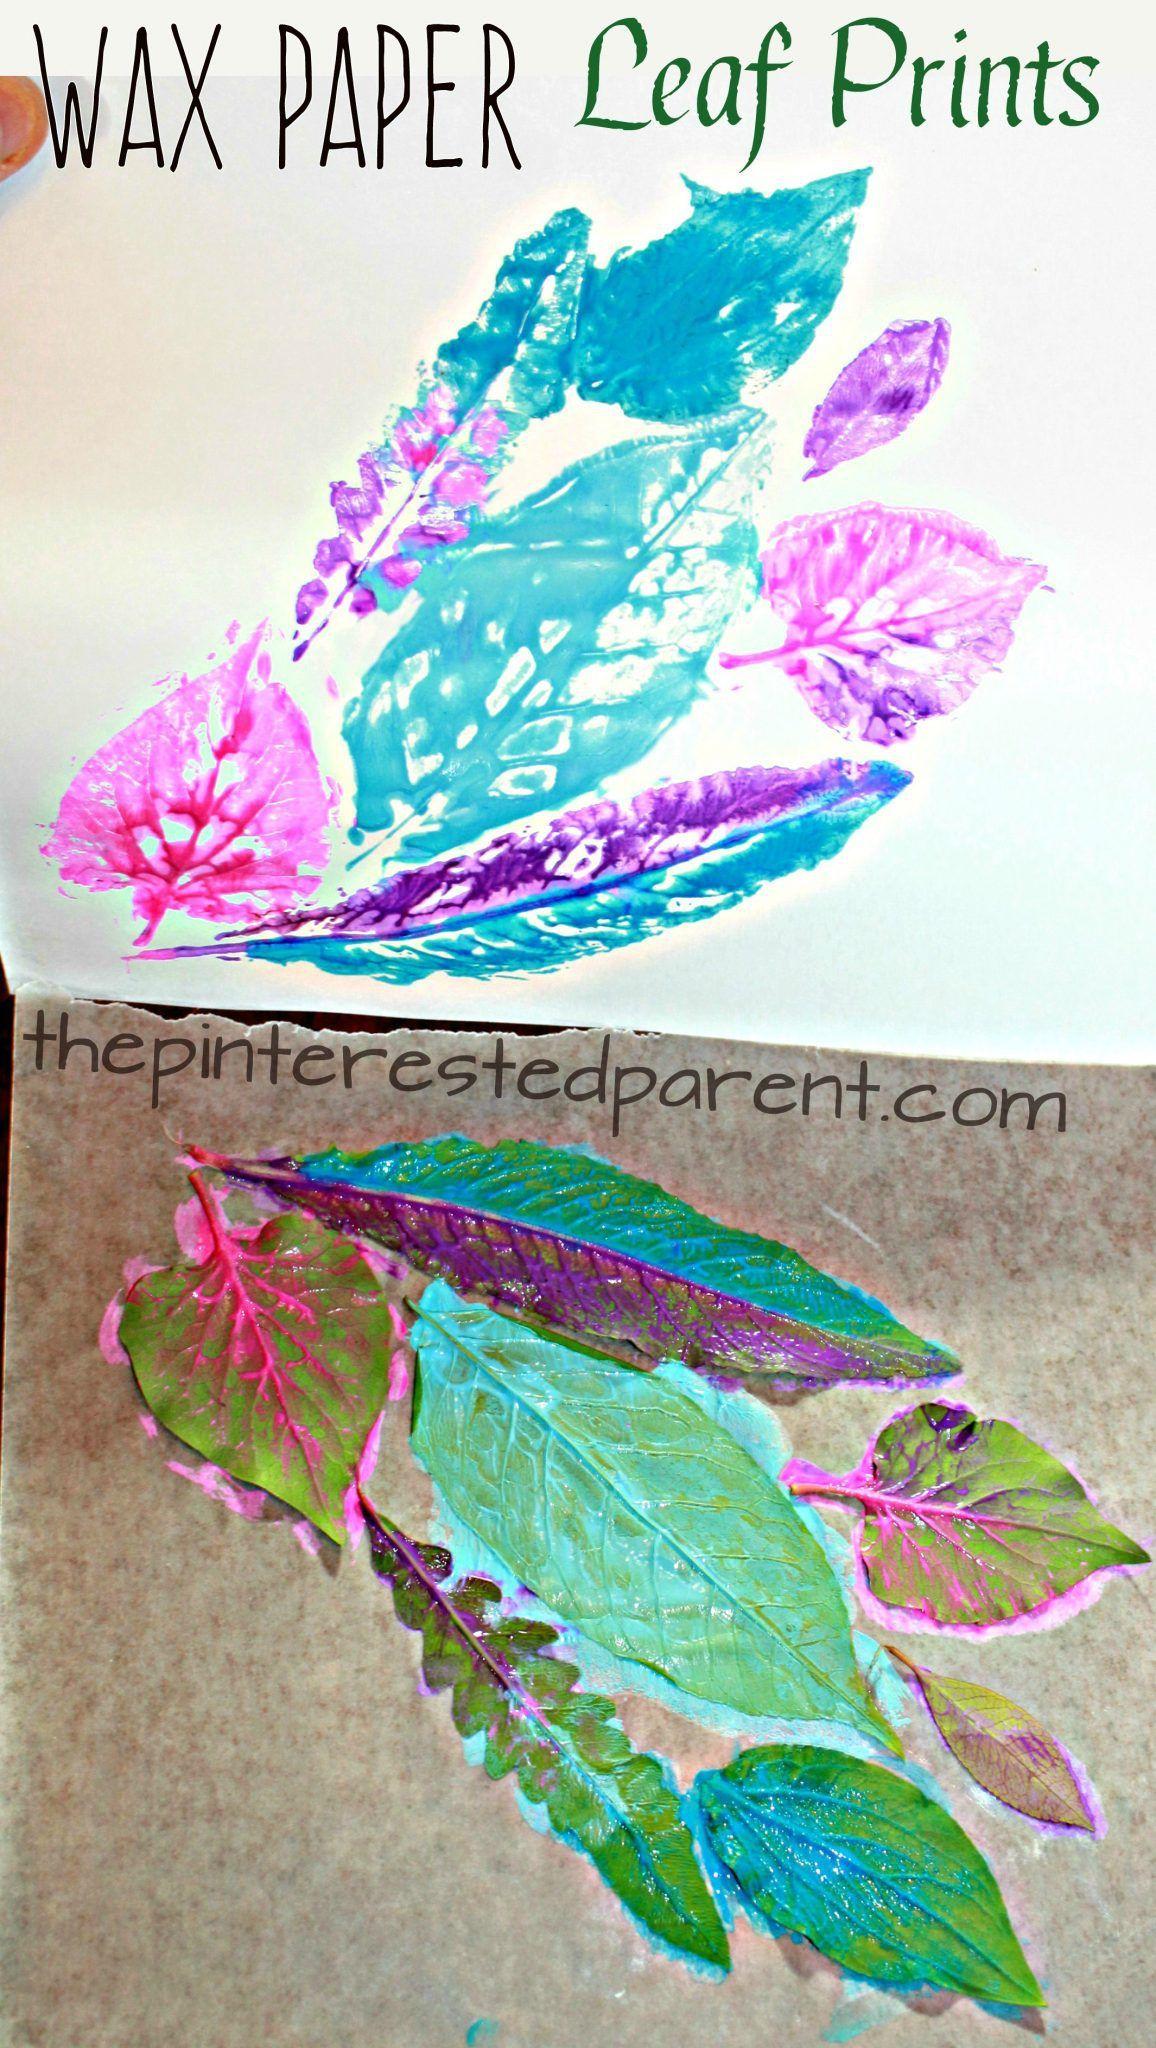 Wax Paper Leaf Prints